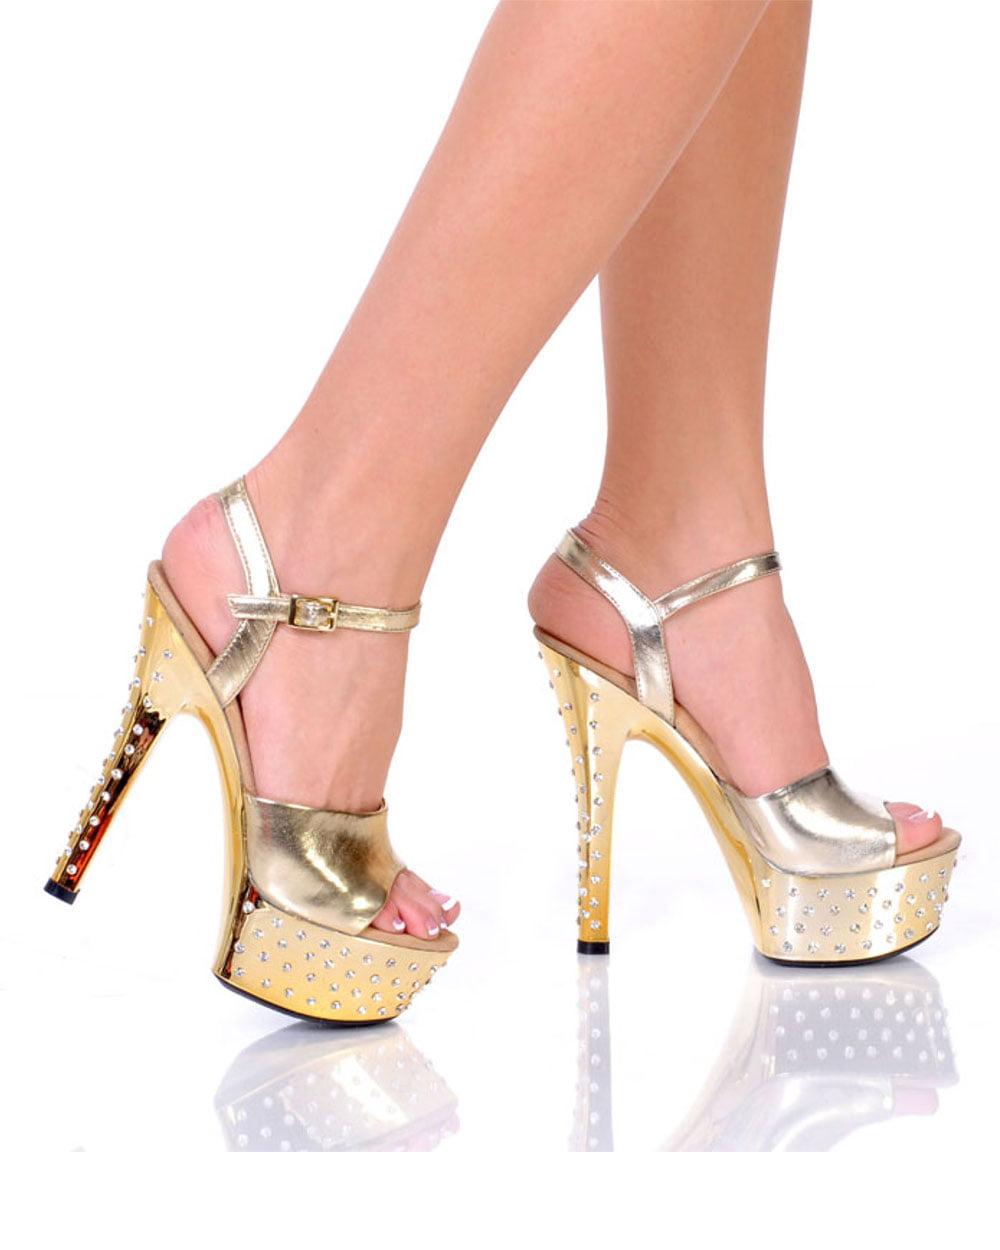 "Women's Shoes 6"" Diamond Drilled Platform With Plain Vamp - Gold Metallic PU"